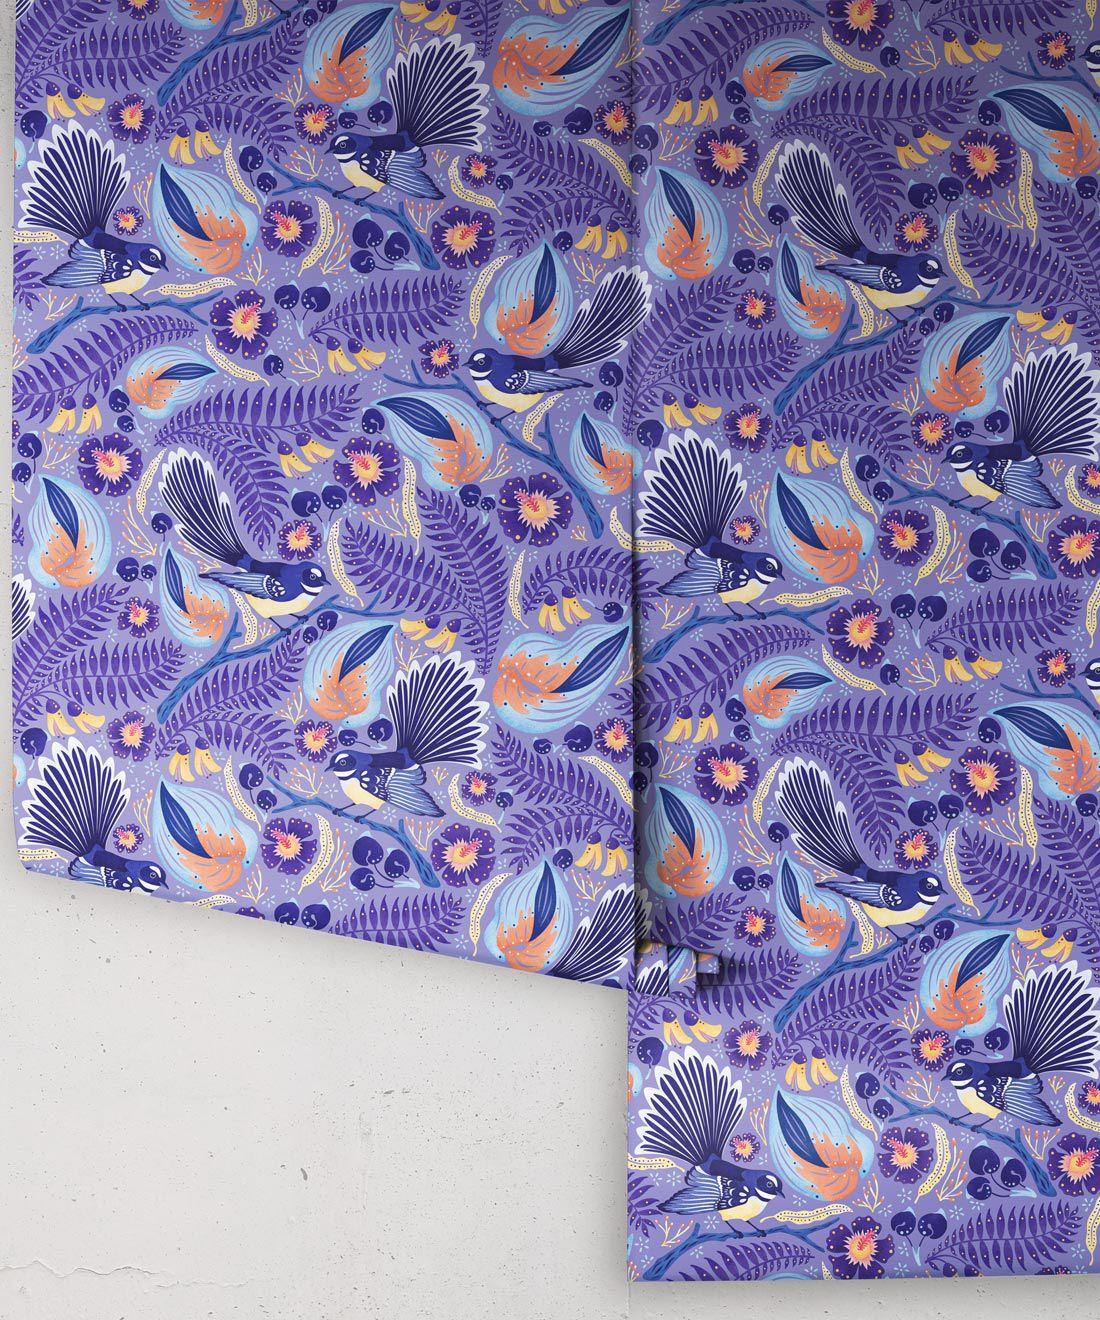 Faintails Wallpaper • New Zealand • Bird Wallpaper • Kowhai Tree • Kowhai Flowers • Blue Purple Wallpaper • Original Colorway • Wallpaper Drops